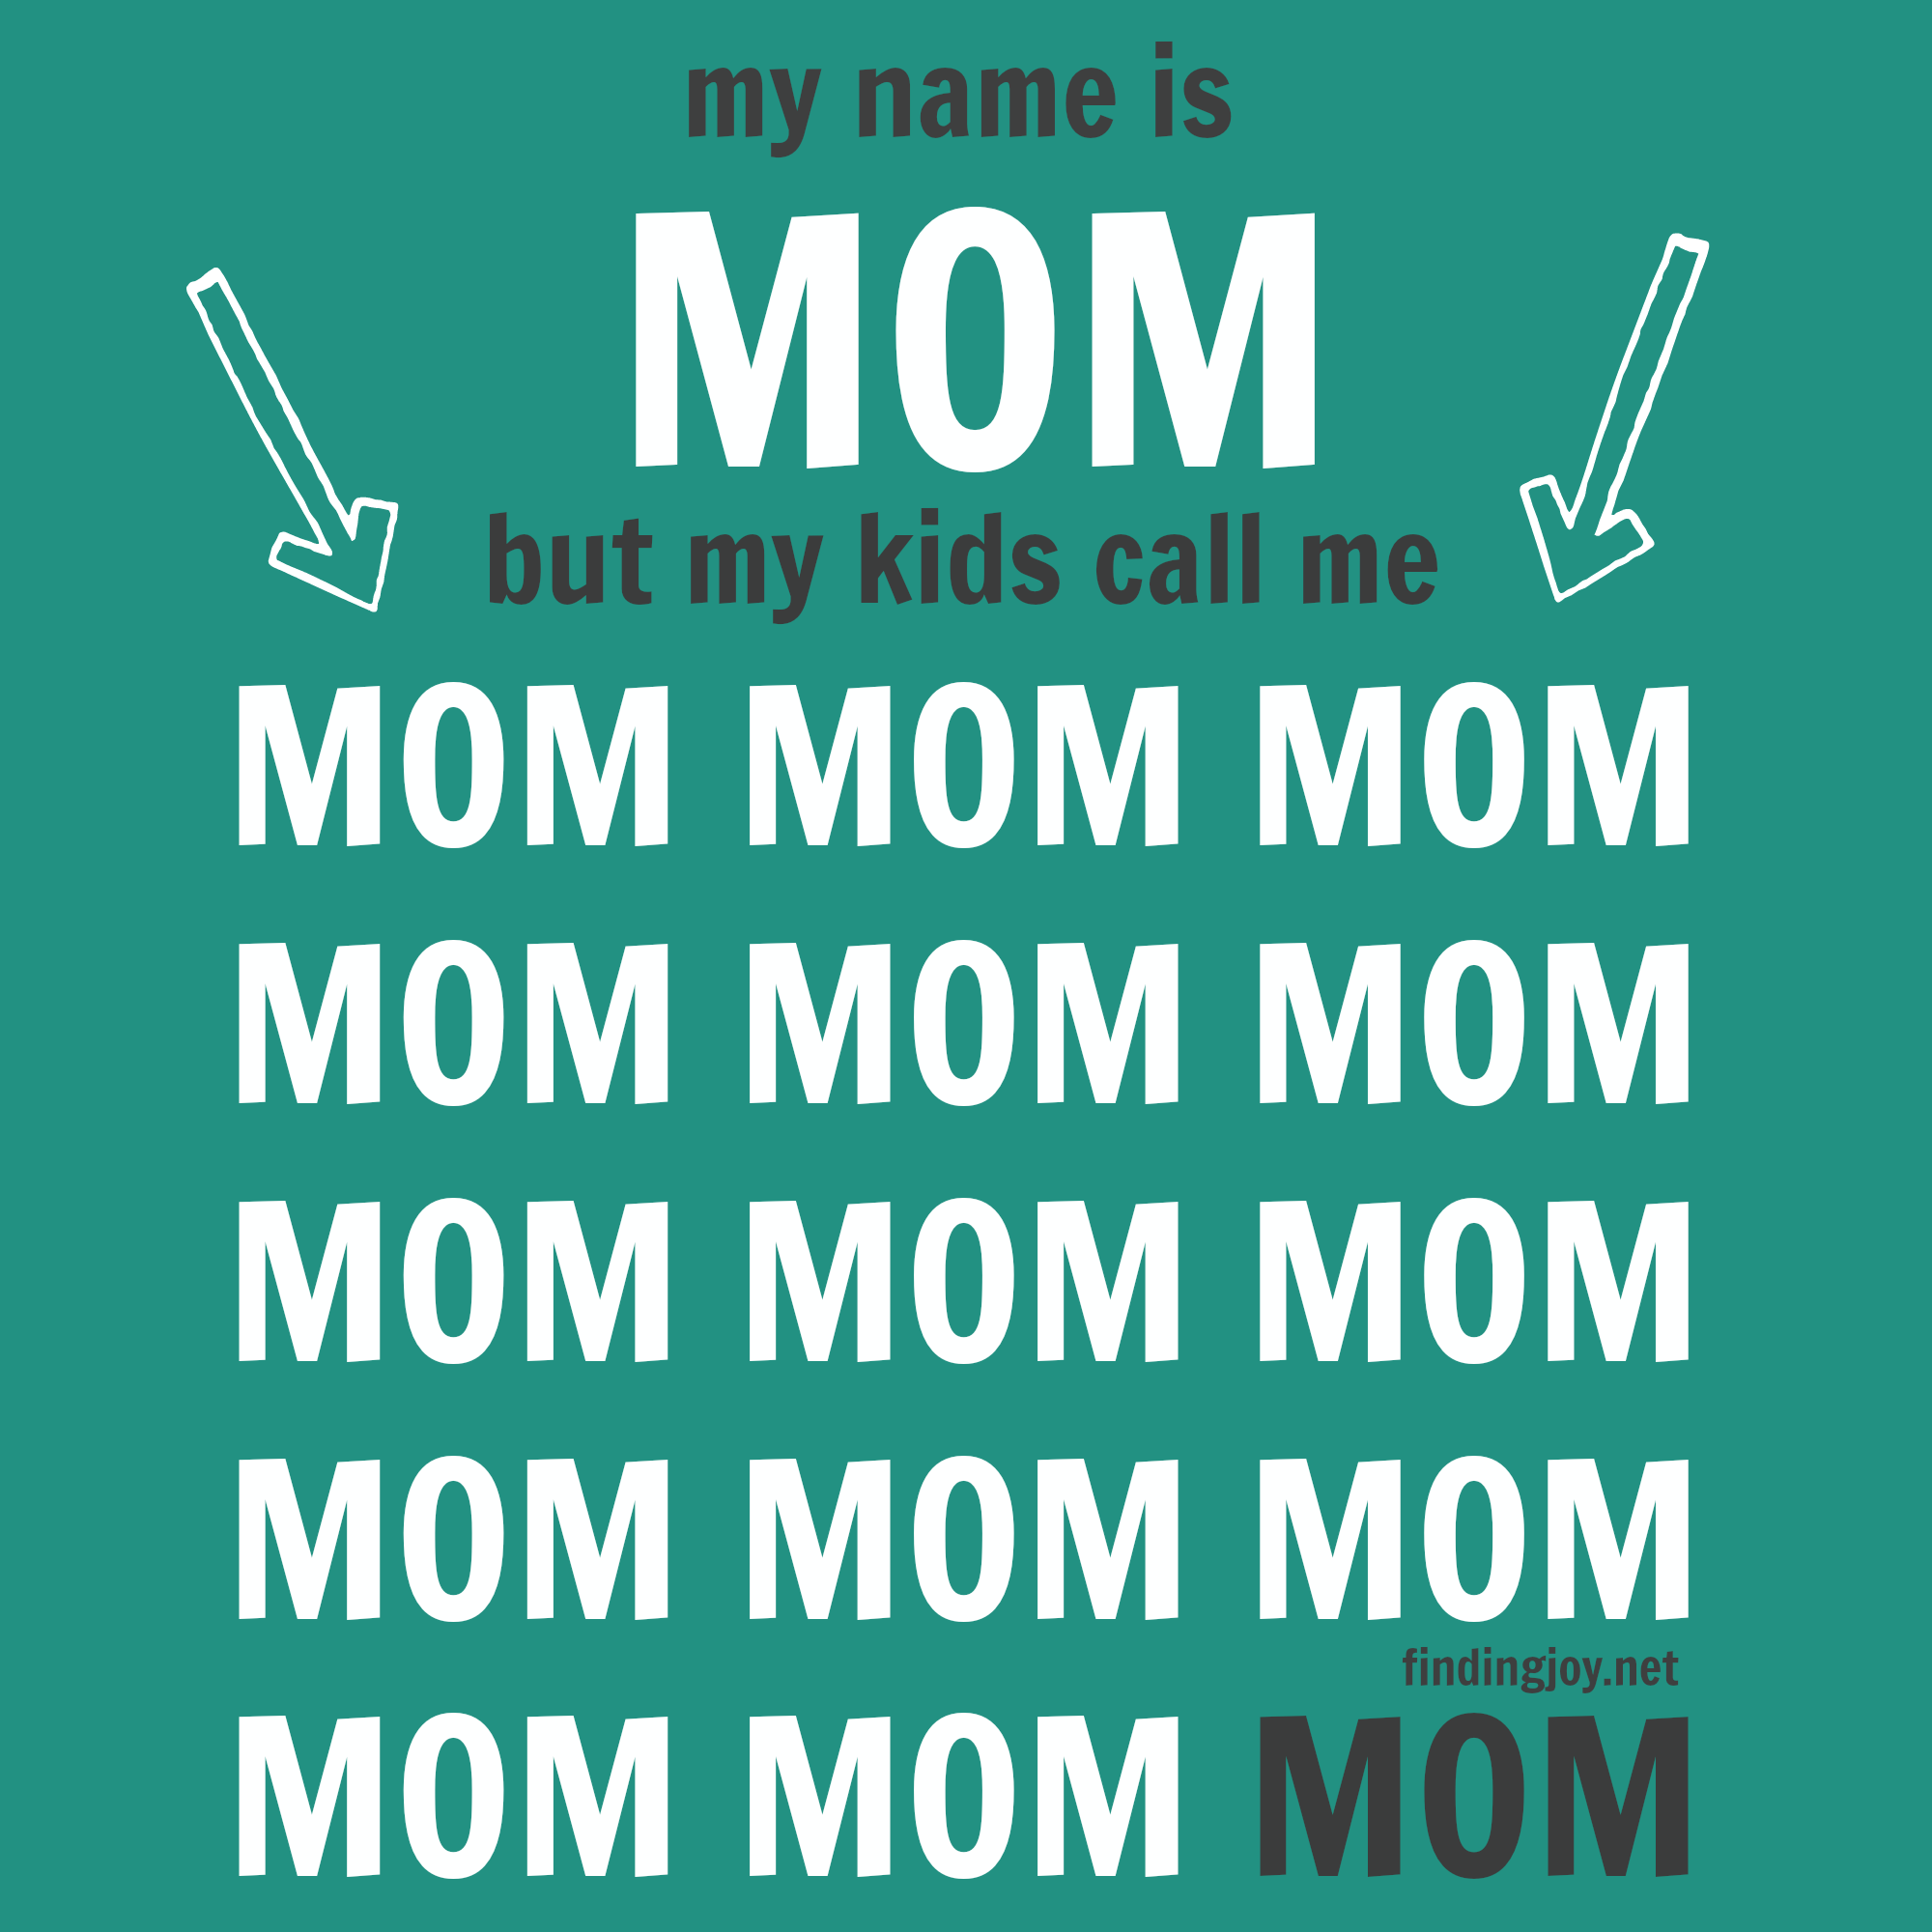 momfindingjoy